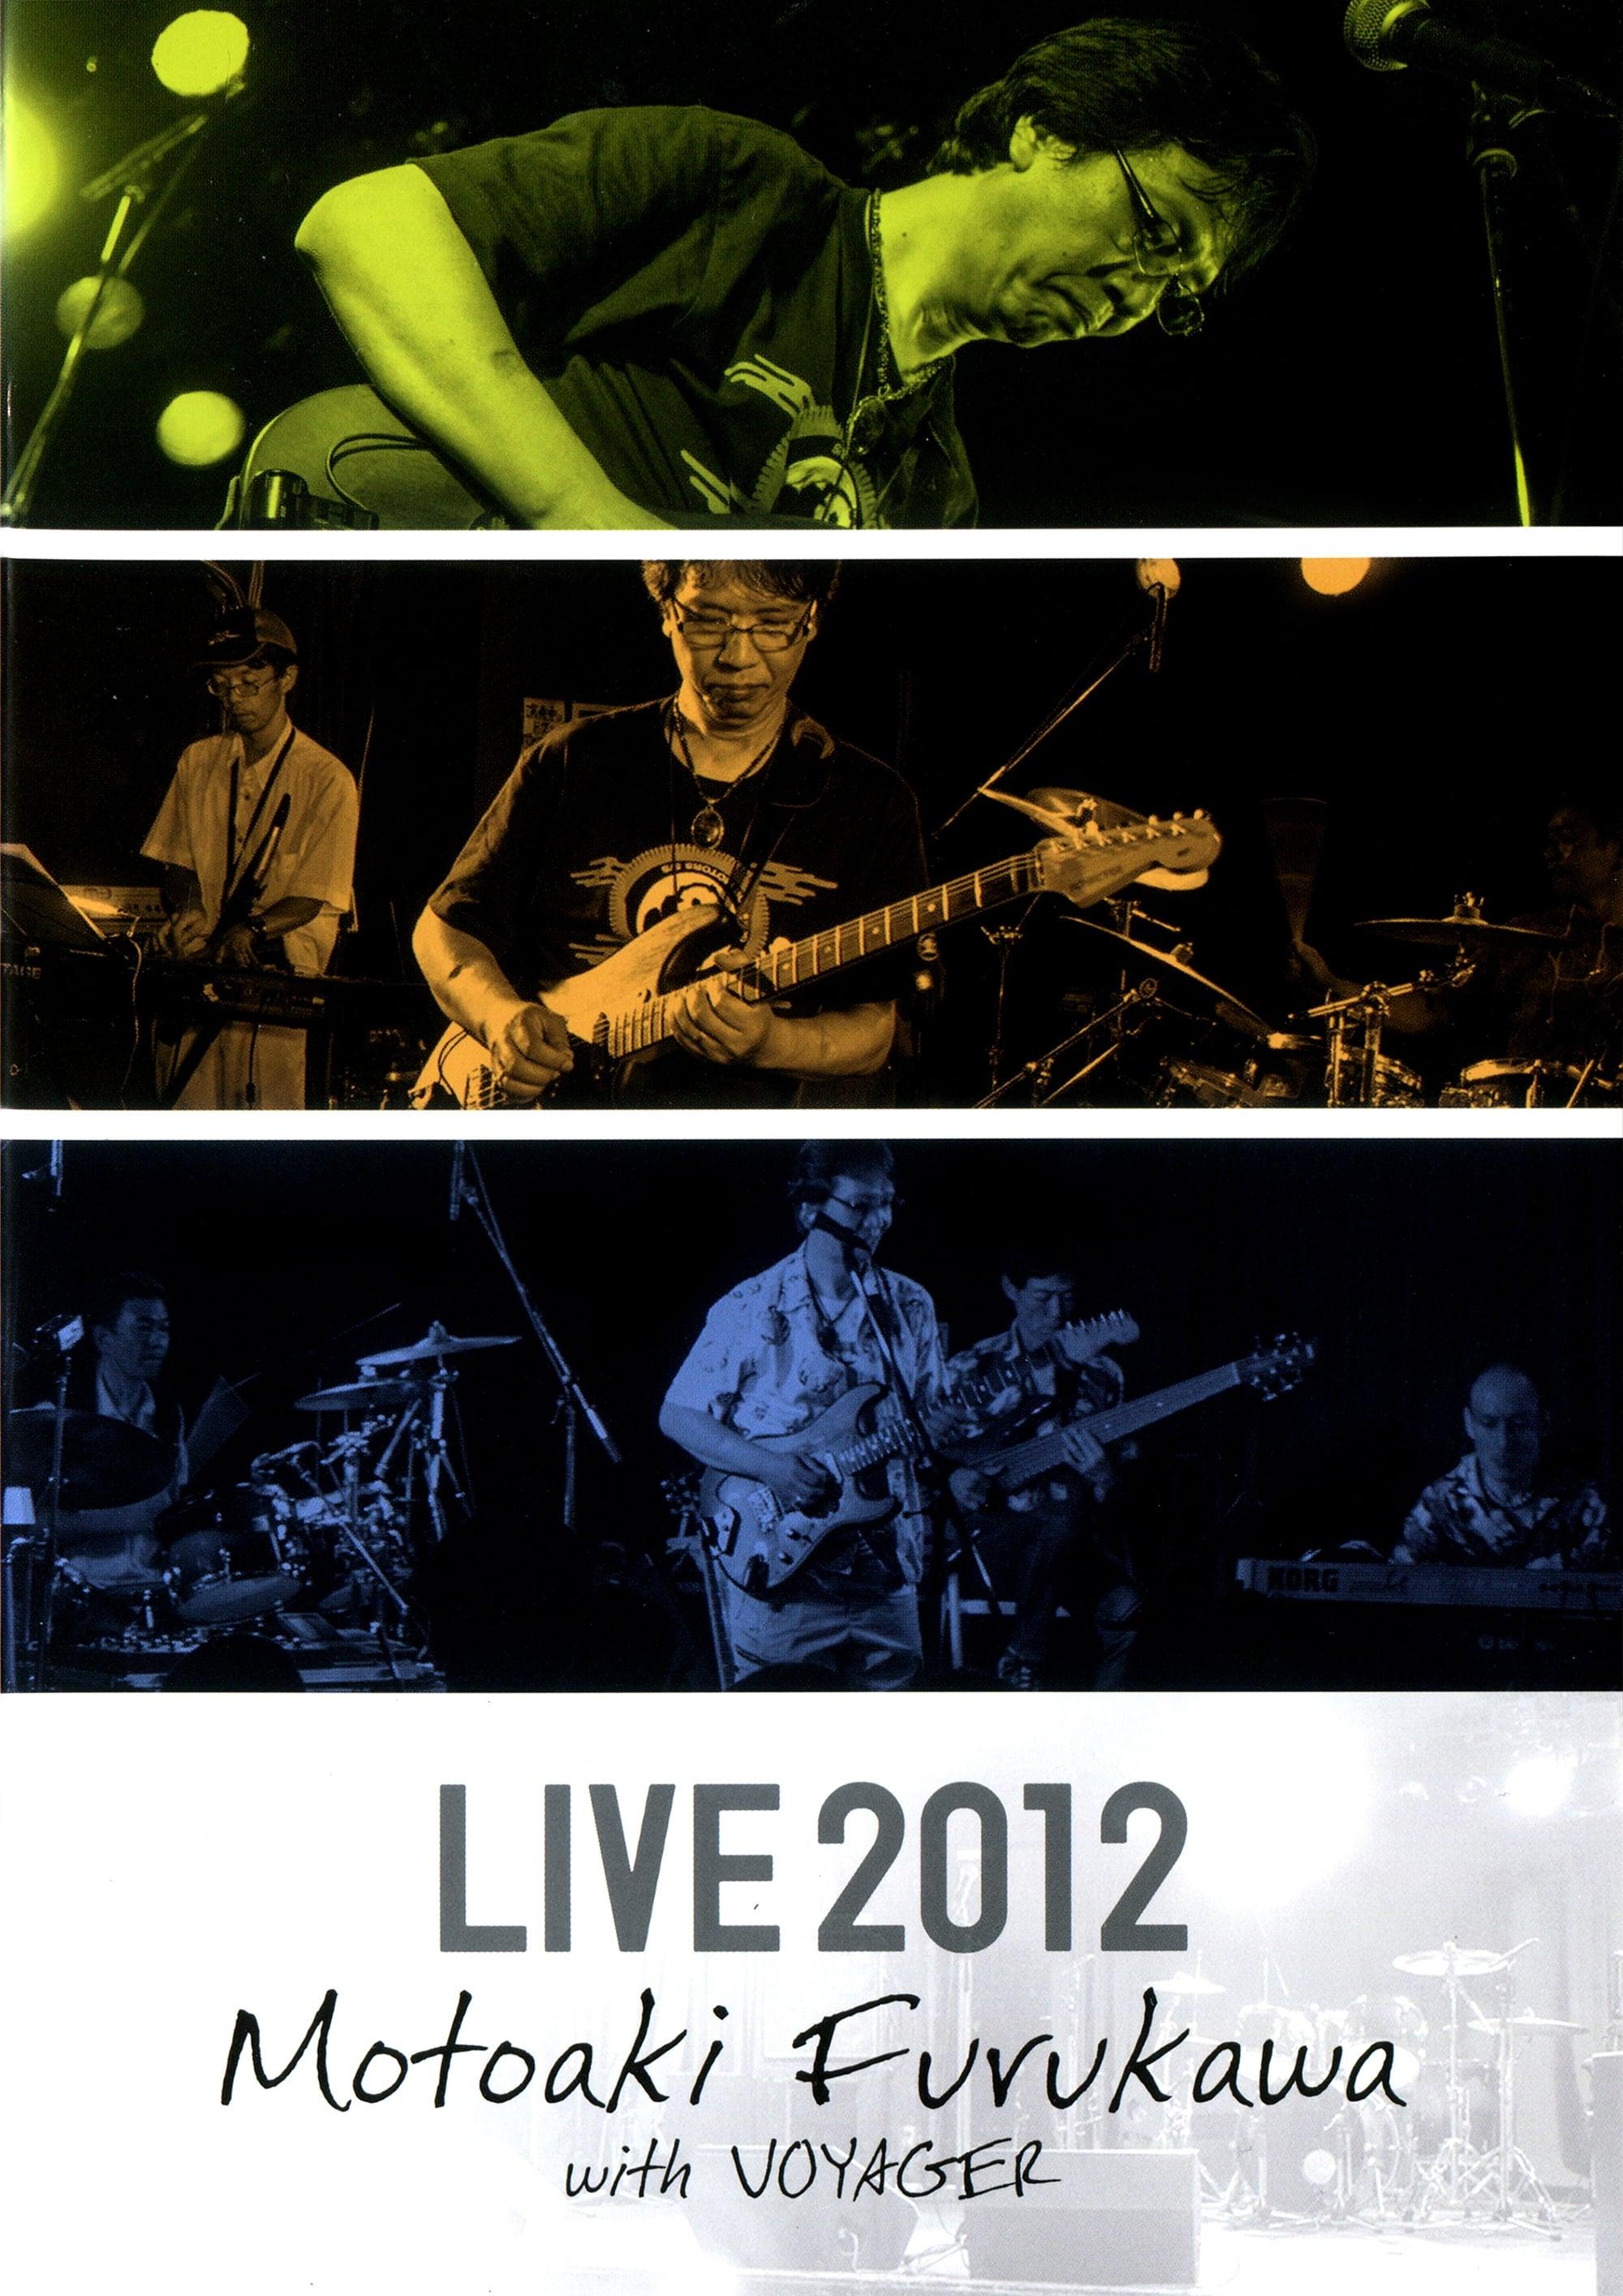 Motoaki Furukawa with VOYAGER LIVE 2012 DVD